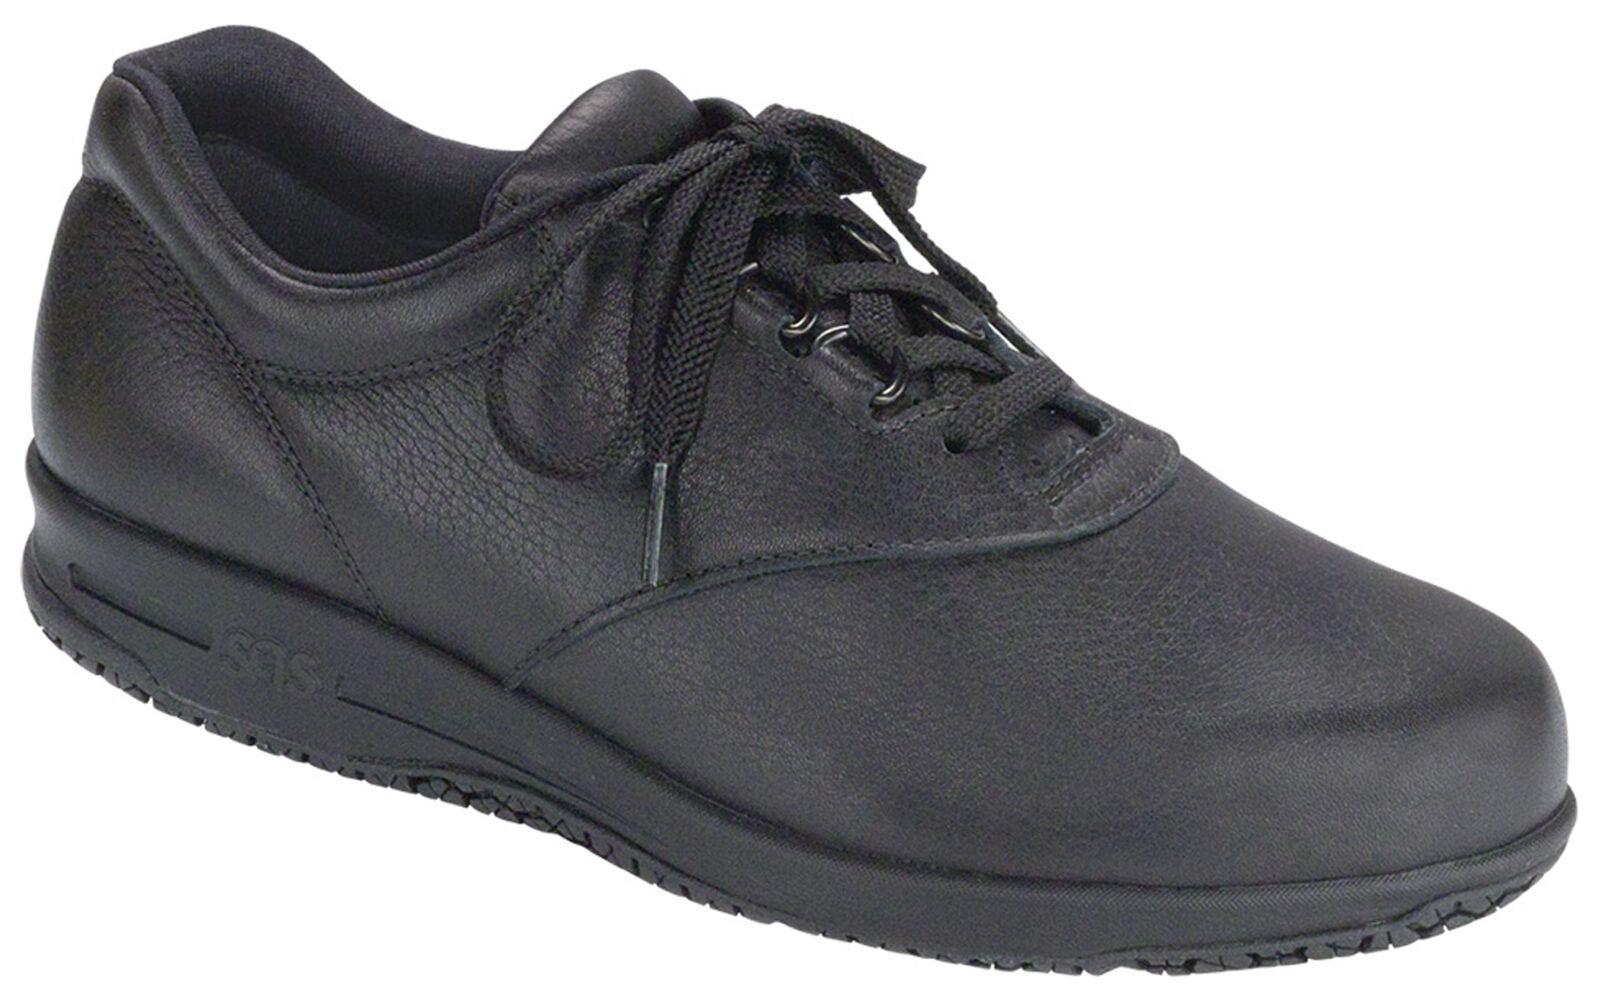 Black No Slip Shoes Women